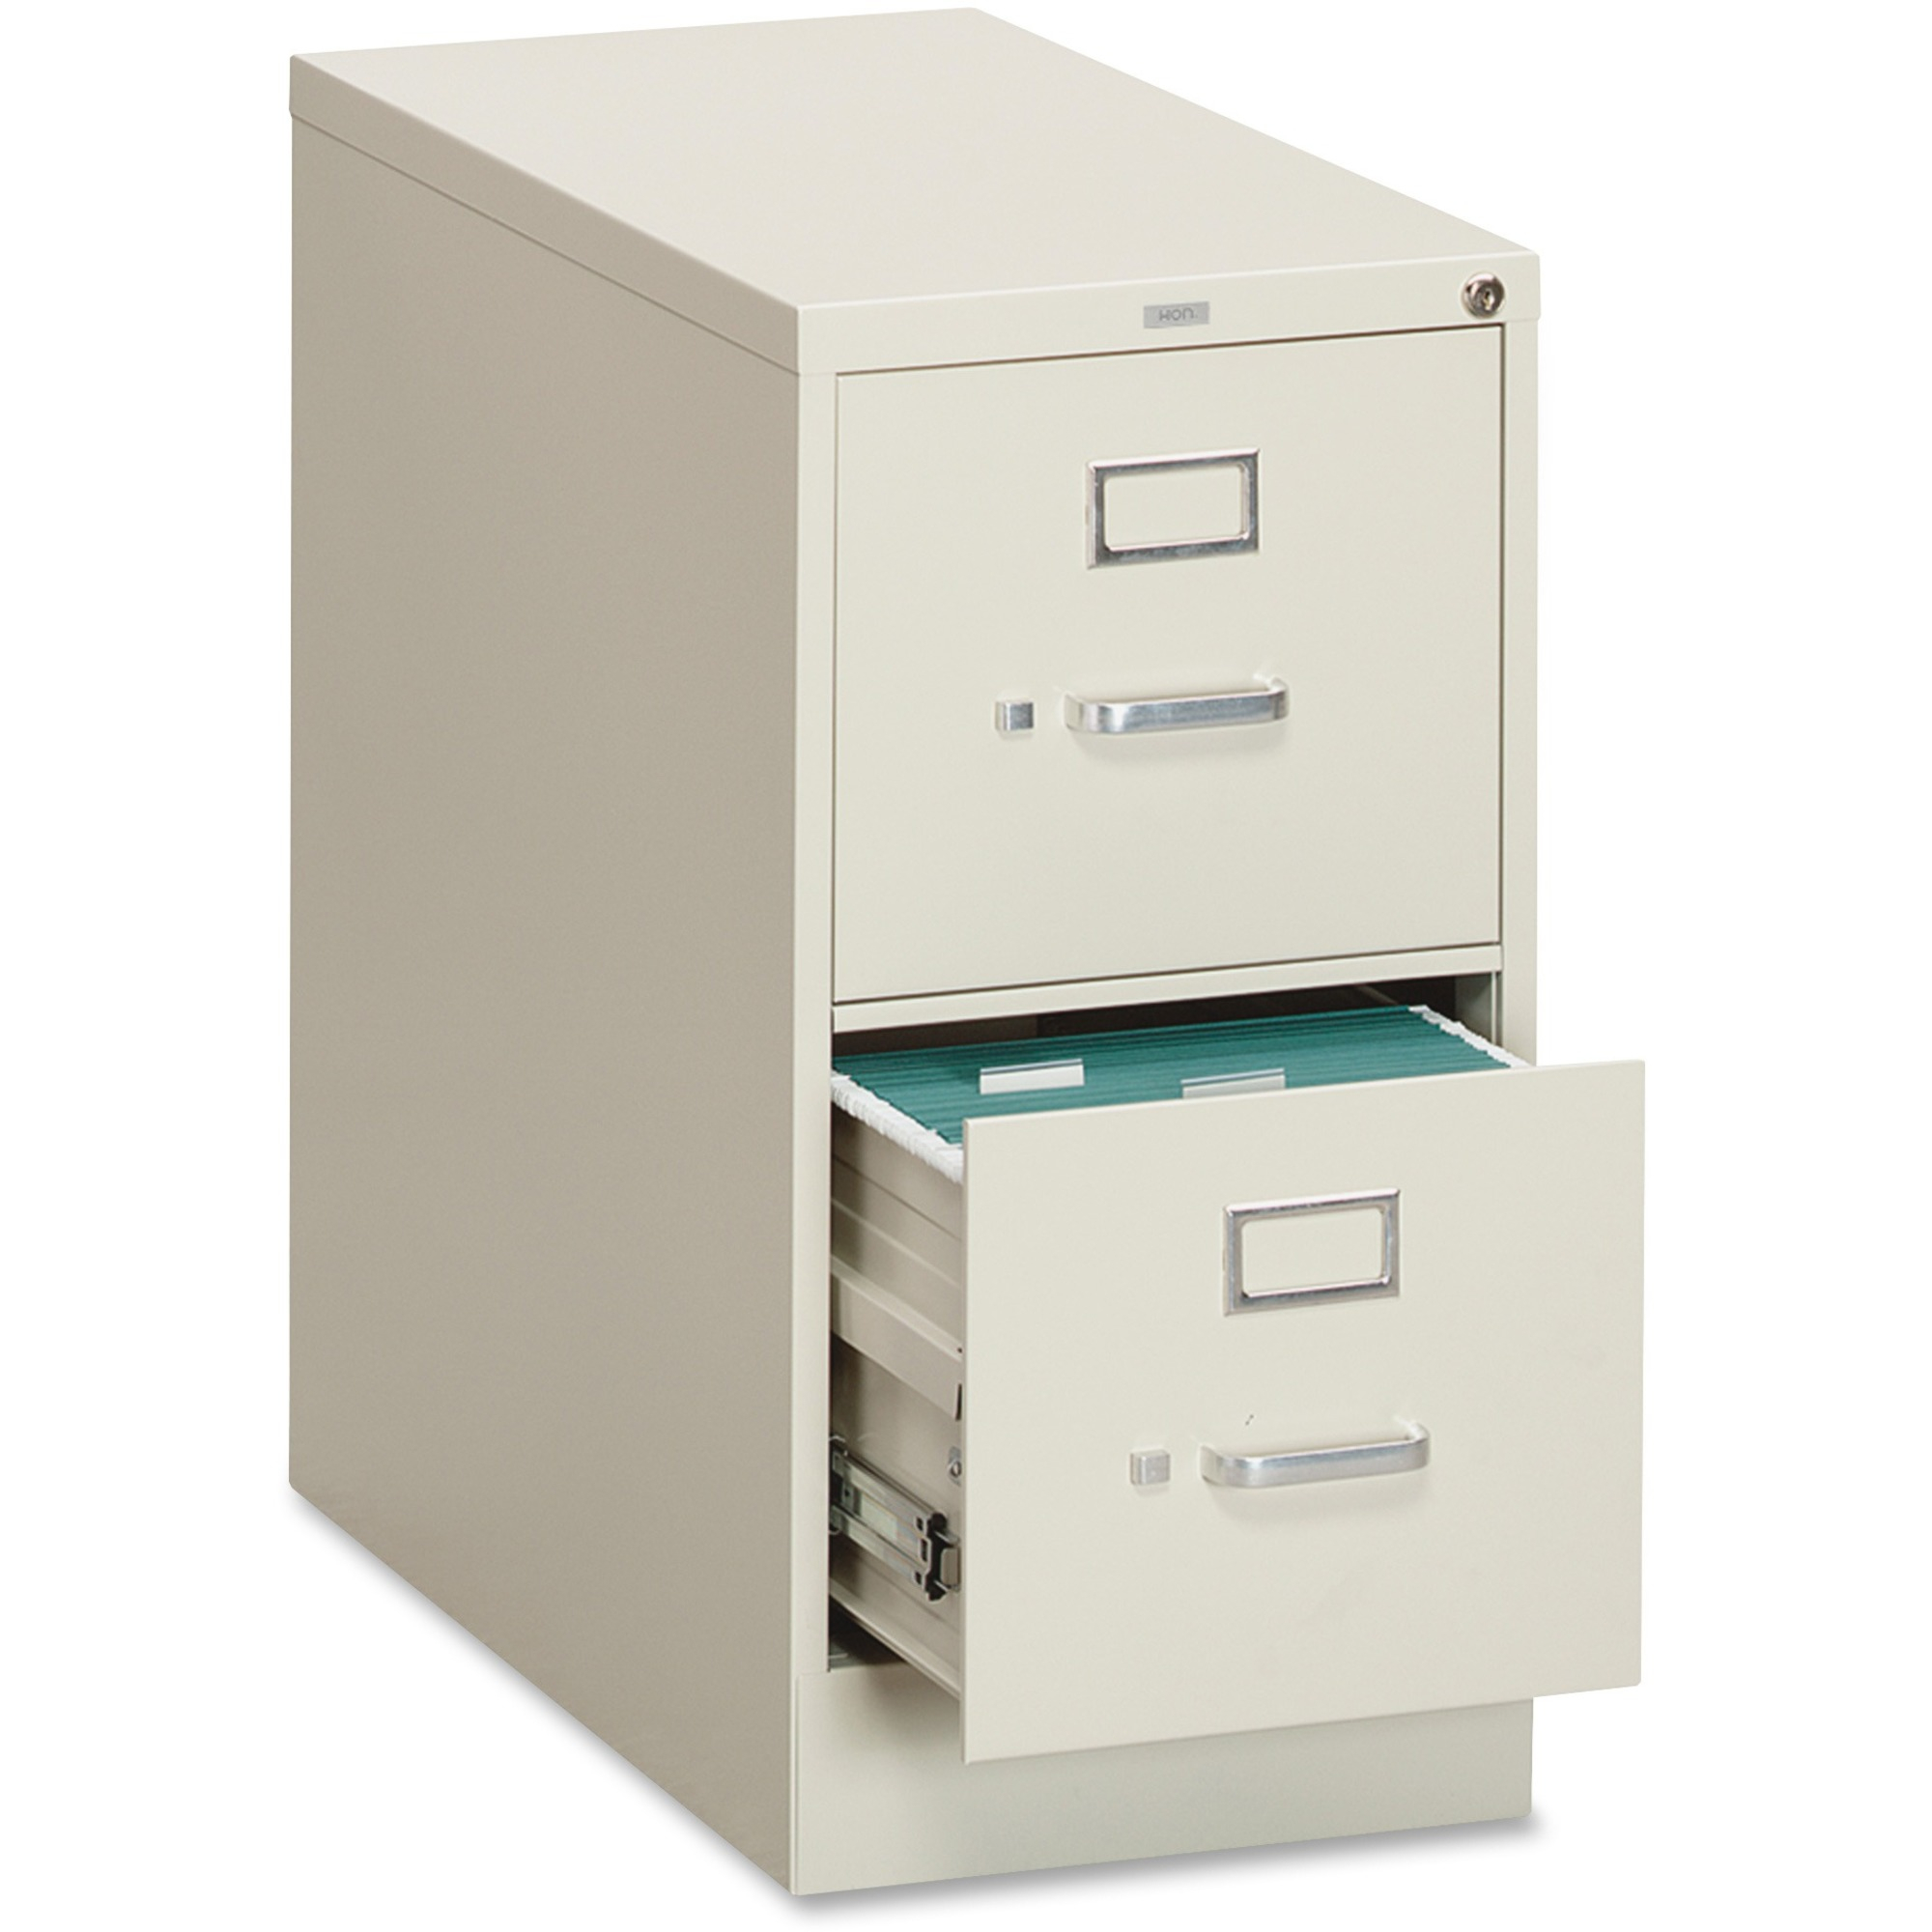 Hon 310 Series 2 Drawer Vertical File 15 X 265 X 29 2 X inside measurements 2000 X 2000